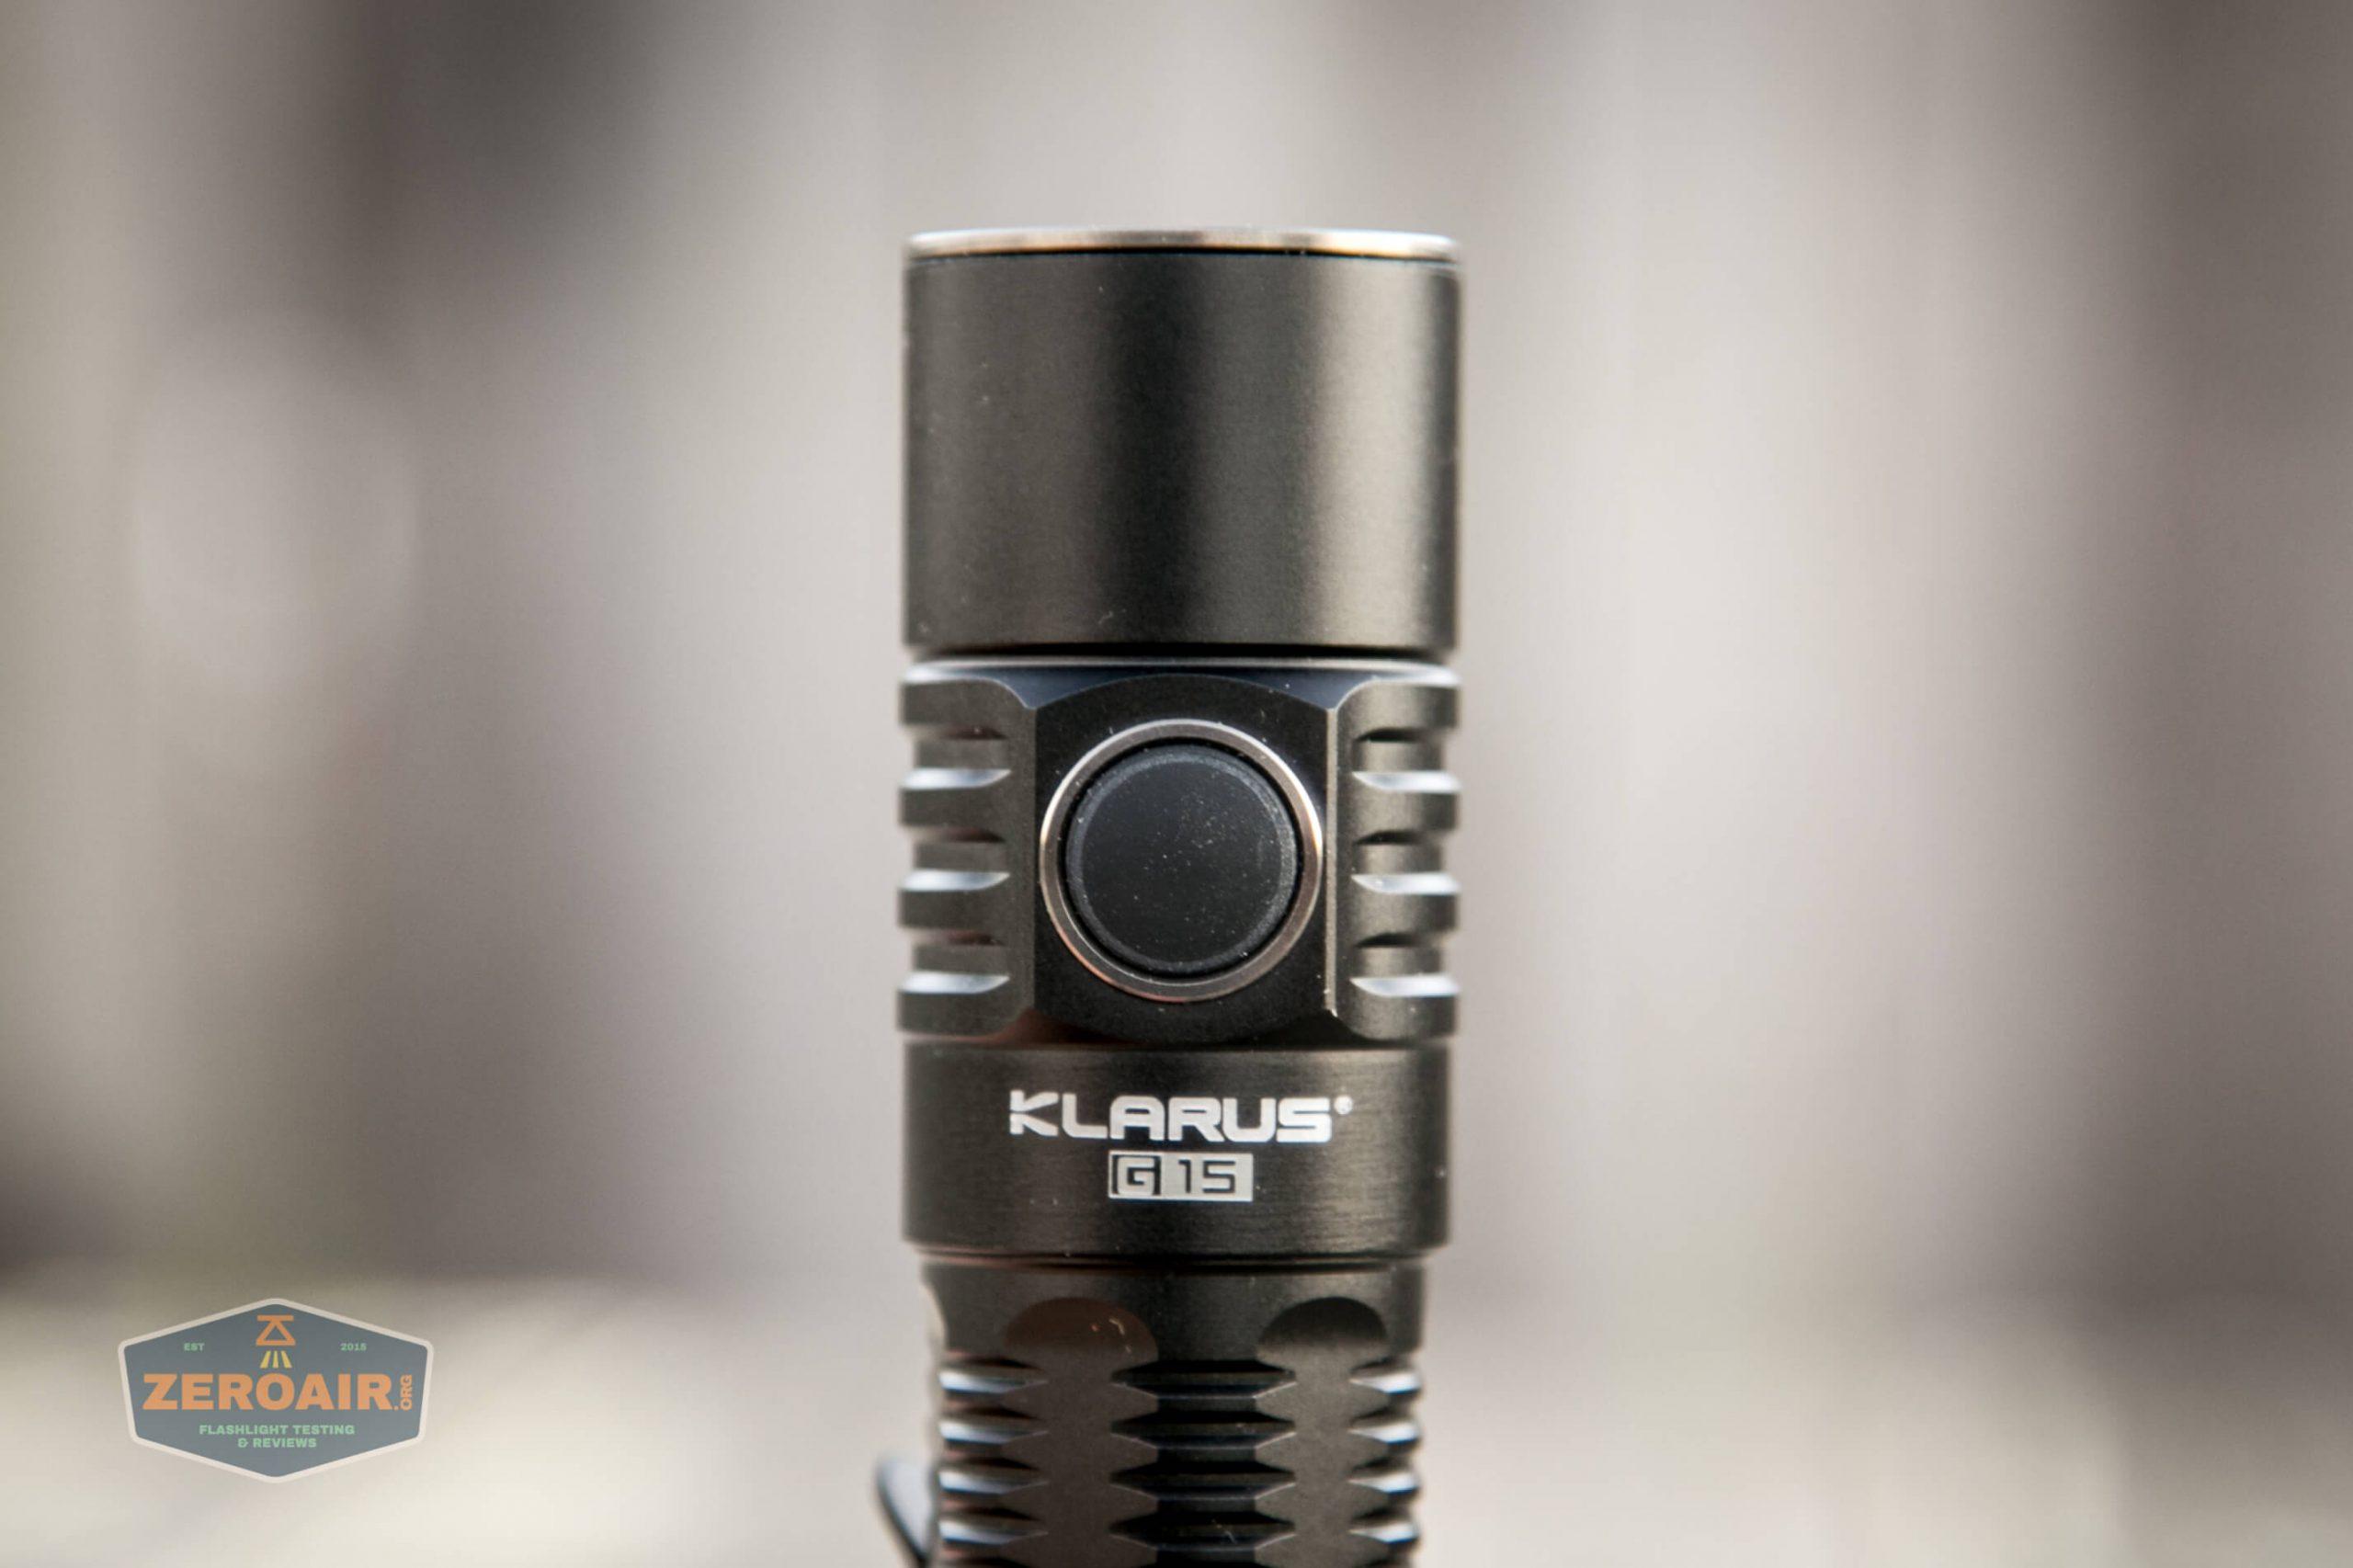 klarus g25 21700 cree xhp70.2 flashlight switch